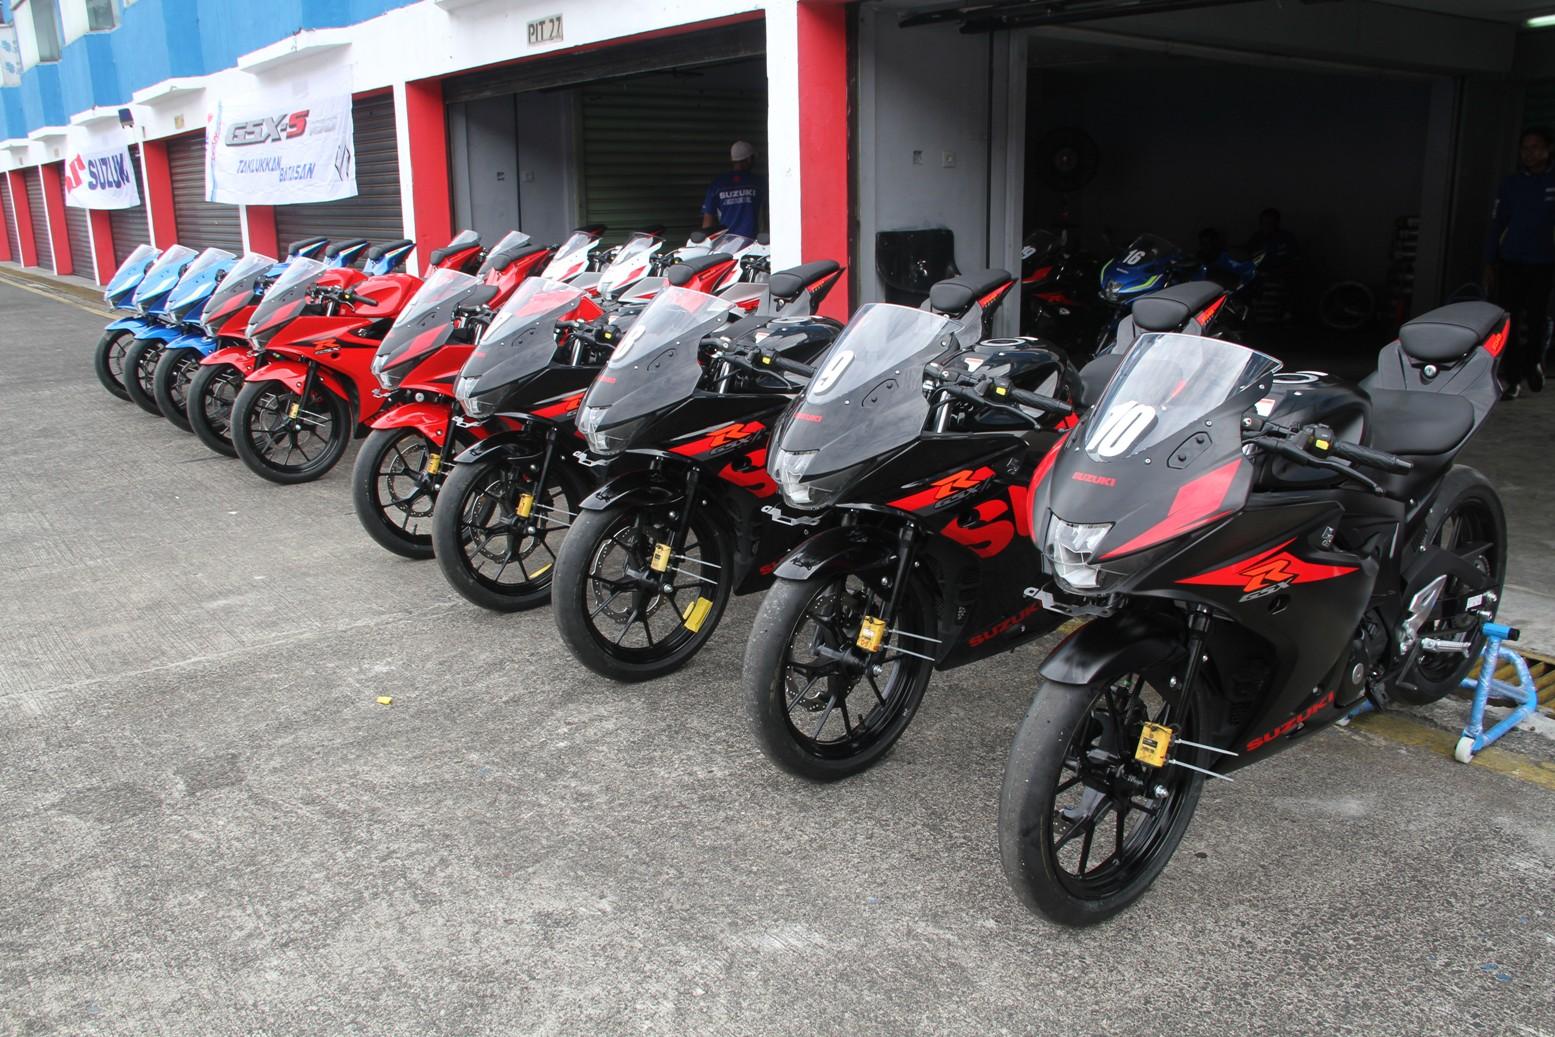 Momen Perdana Media Tanah Air Uji Performa Suzuki Gsx R150 Pt